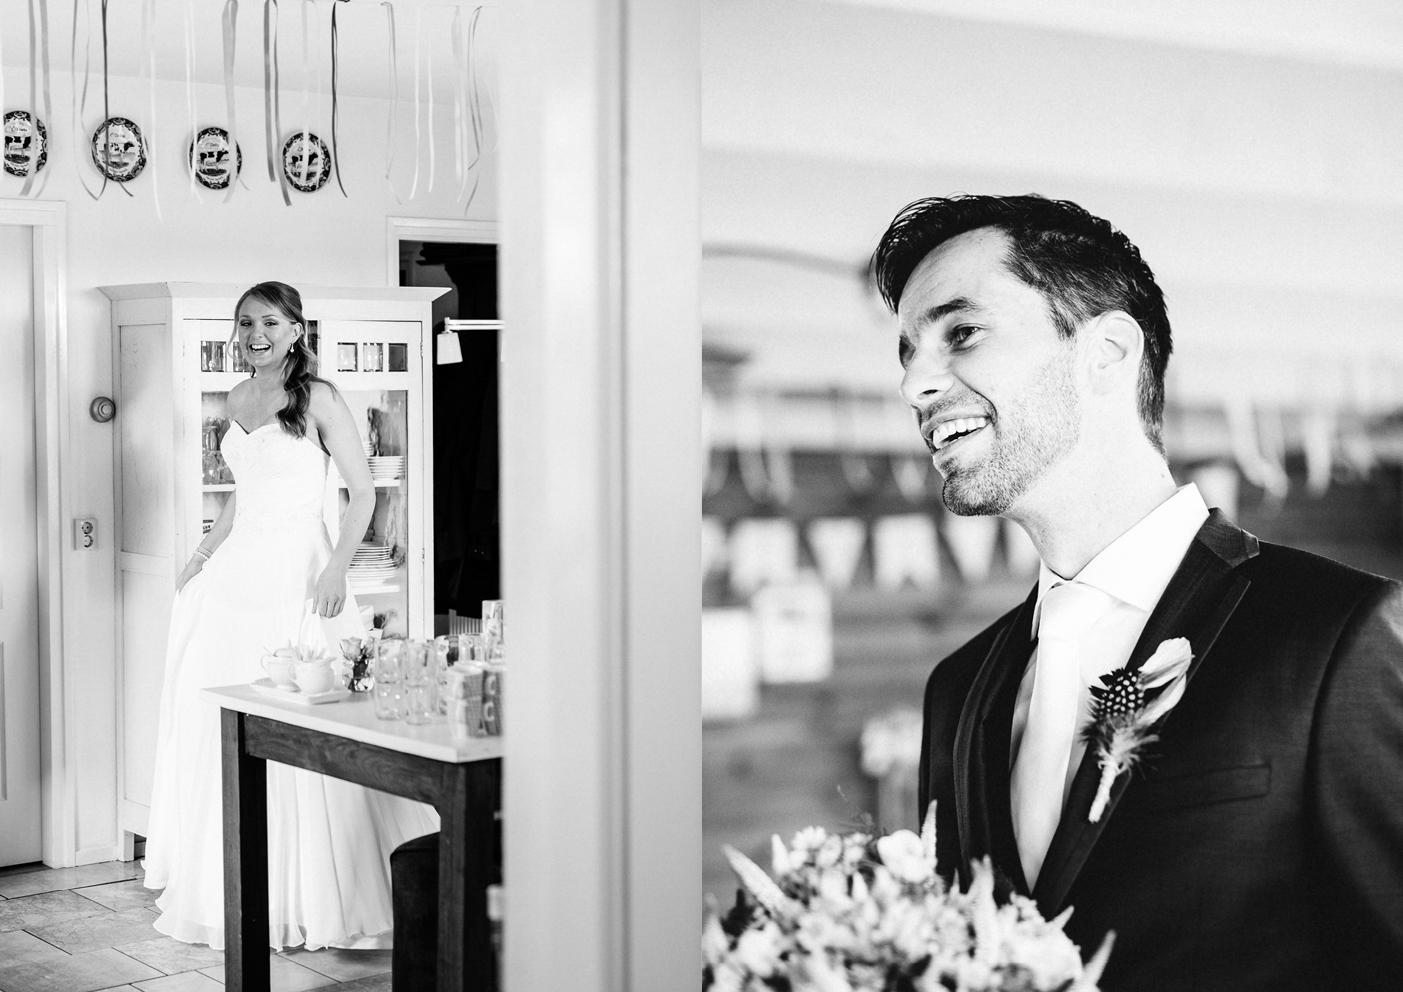 07 van 51 - trouwfotografie-gelske-reinier-friesland - 01